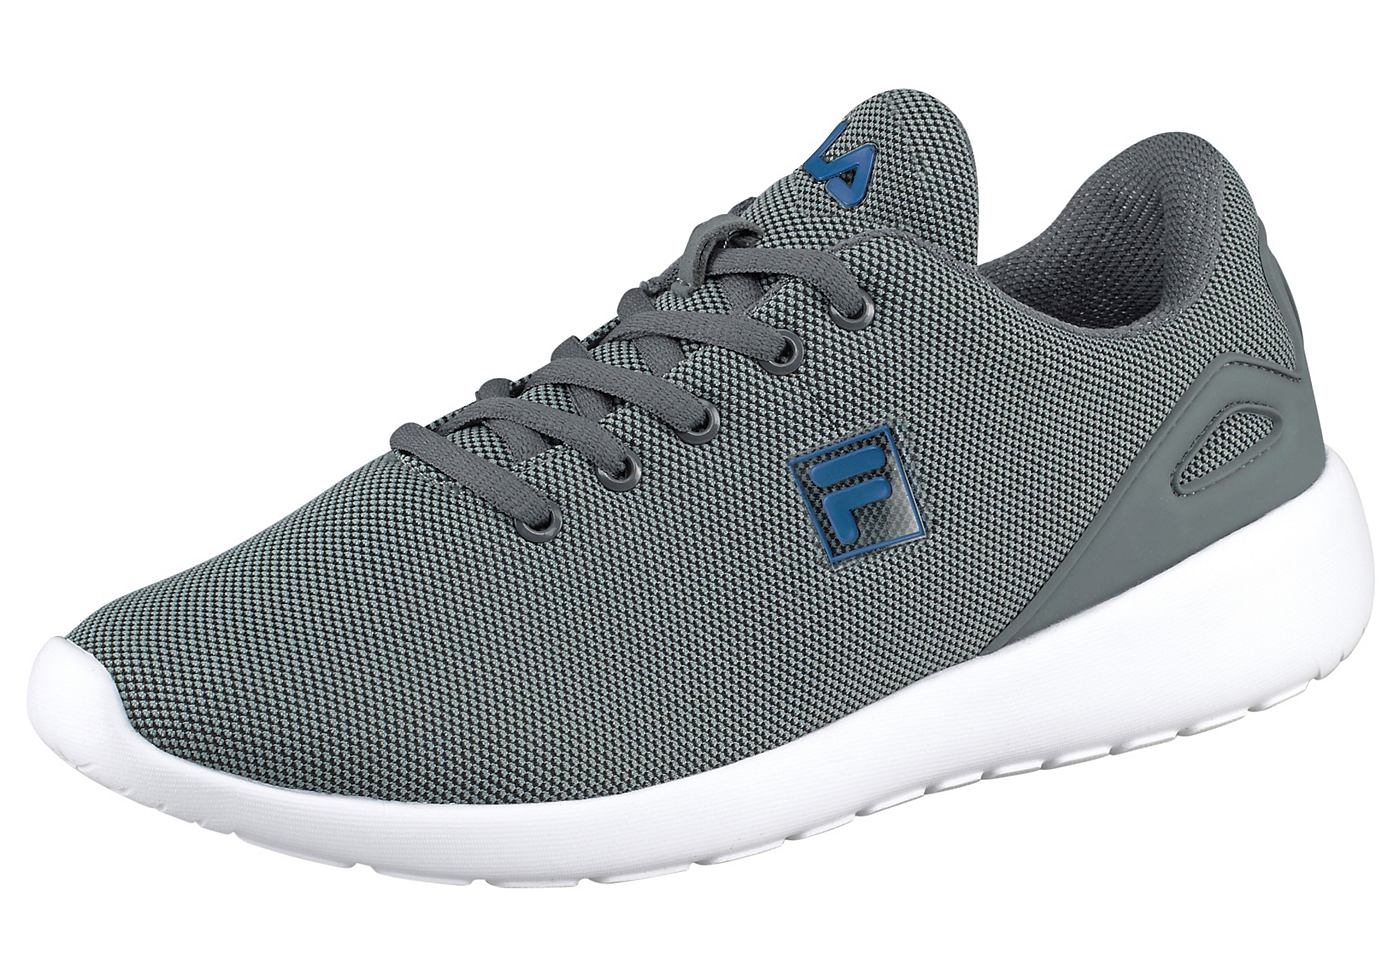 FILA Fury Run Men sneakers